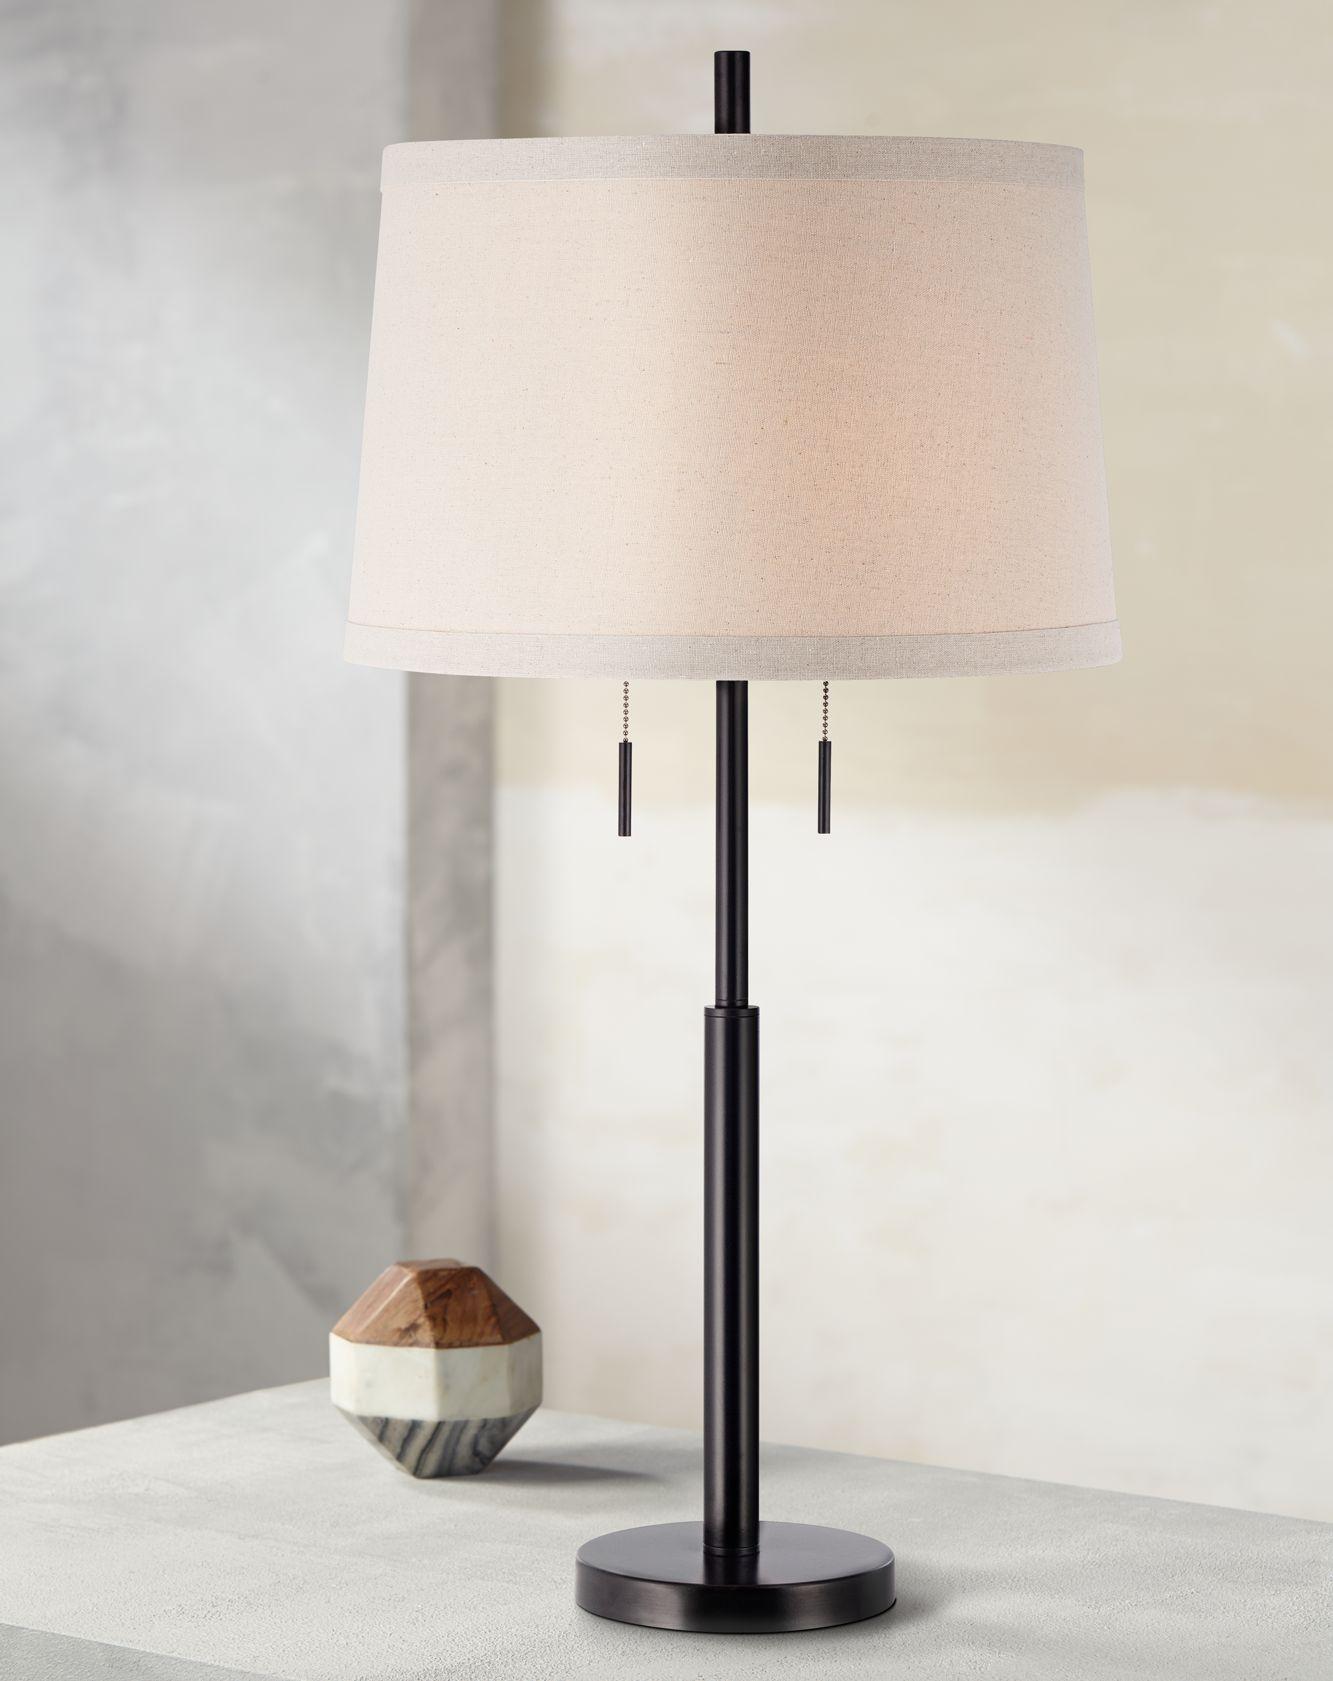 Buffet lamps Possini Euro Design matt dark bronze rod table lamp MDATJEX